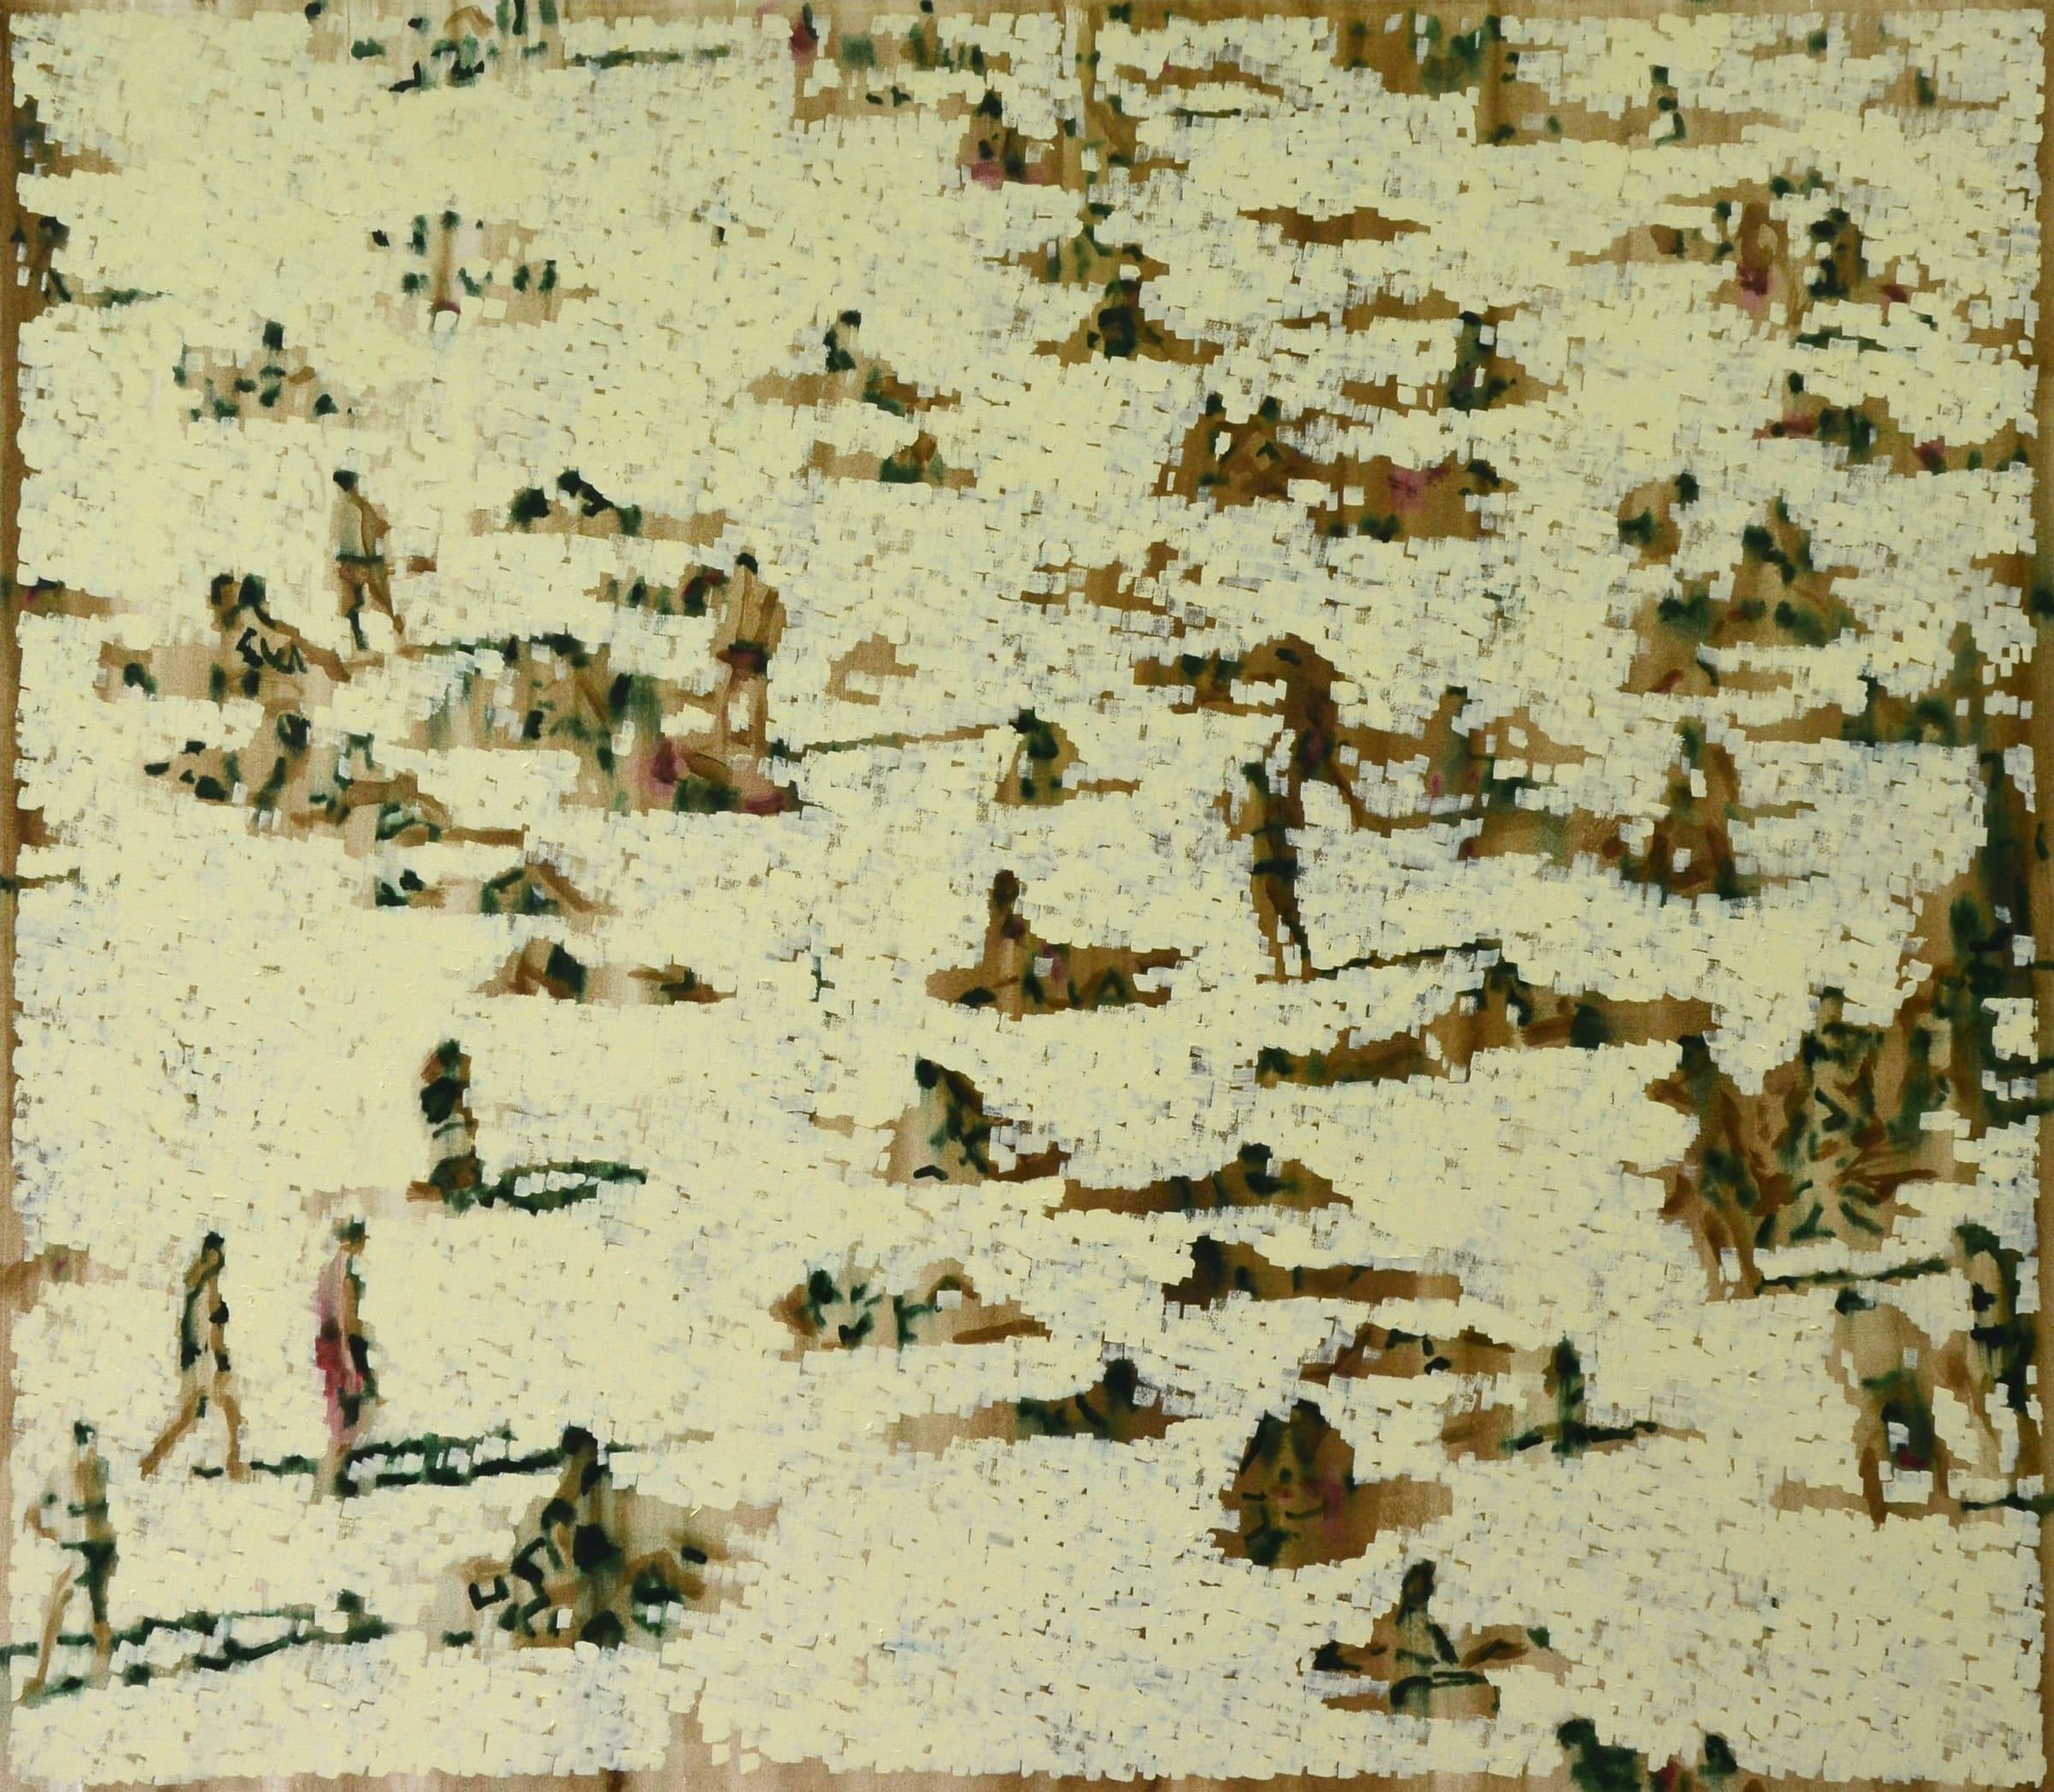 "<span class=""link fancybox-details-link""><a href=""/artists/42-nick-bodimeade/works/5853-nick-bodimeade-beach-geometry-2018/"">View Detail Page</a></span><div class=""artist""><strong>Nick Bodimeade</strong></div> b. 1957 <div class=""title""><em>Beach Geometry</em>, 2018</div> <div class=""signed_and_dated"">signed, titled and dated on reverse</div> <div class=""dimensions"">104 x 120 cm<br /> 41 x 47 1/4 inches</div><div class=""price"">£4,400.00</div><div class=""copyright_line"">OwnArt: £ 250 x 10 Months, 0% APR + £ 1,900 deposit</div>"